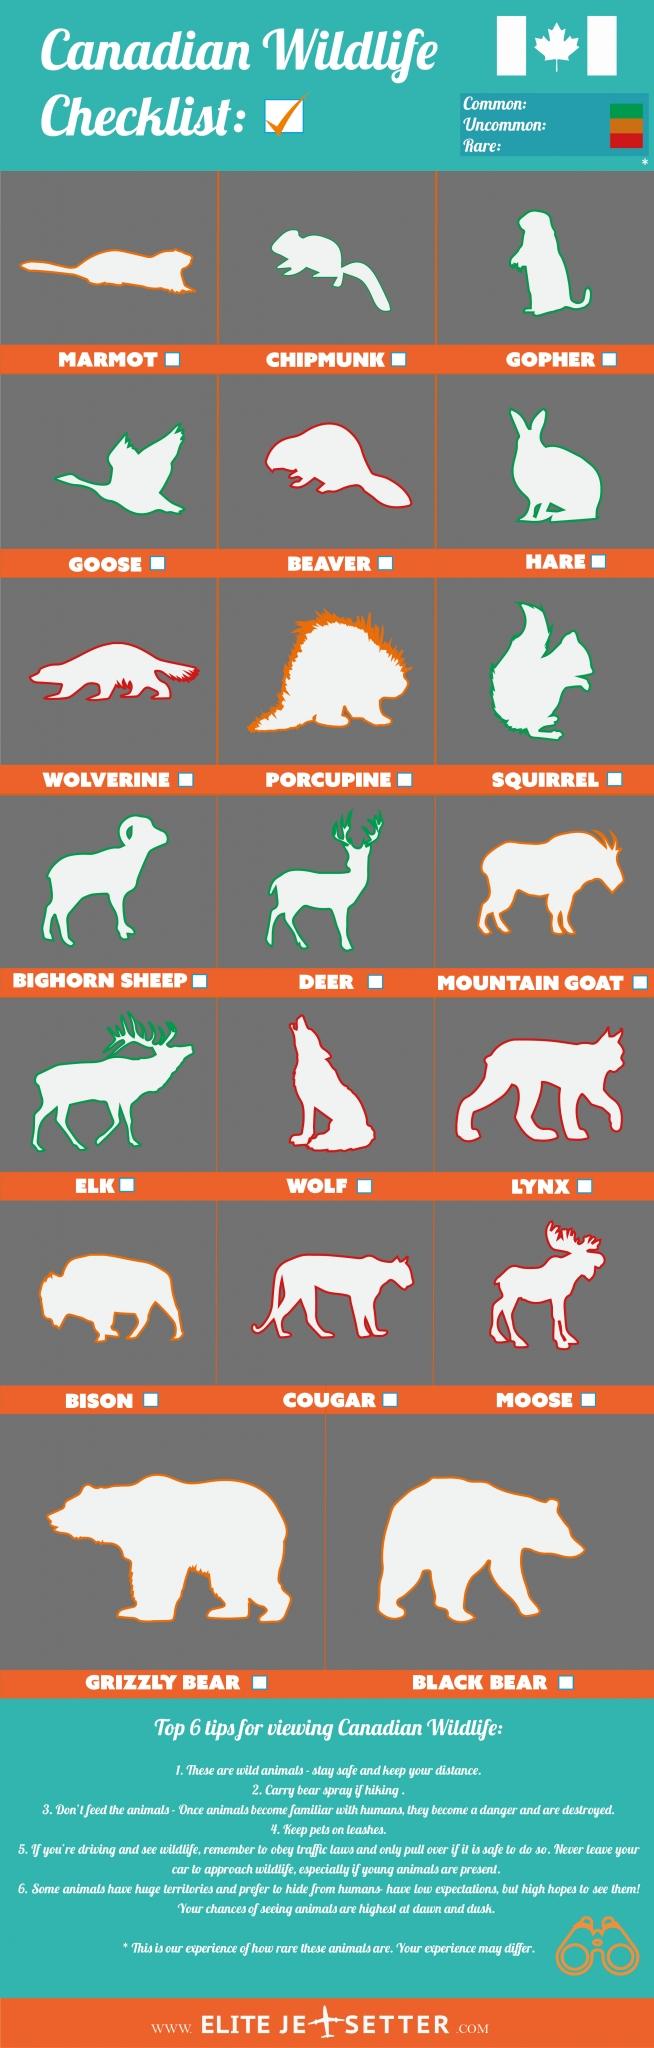 Canadian Animal checklist